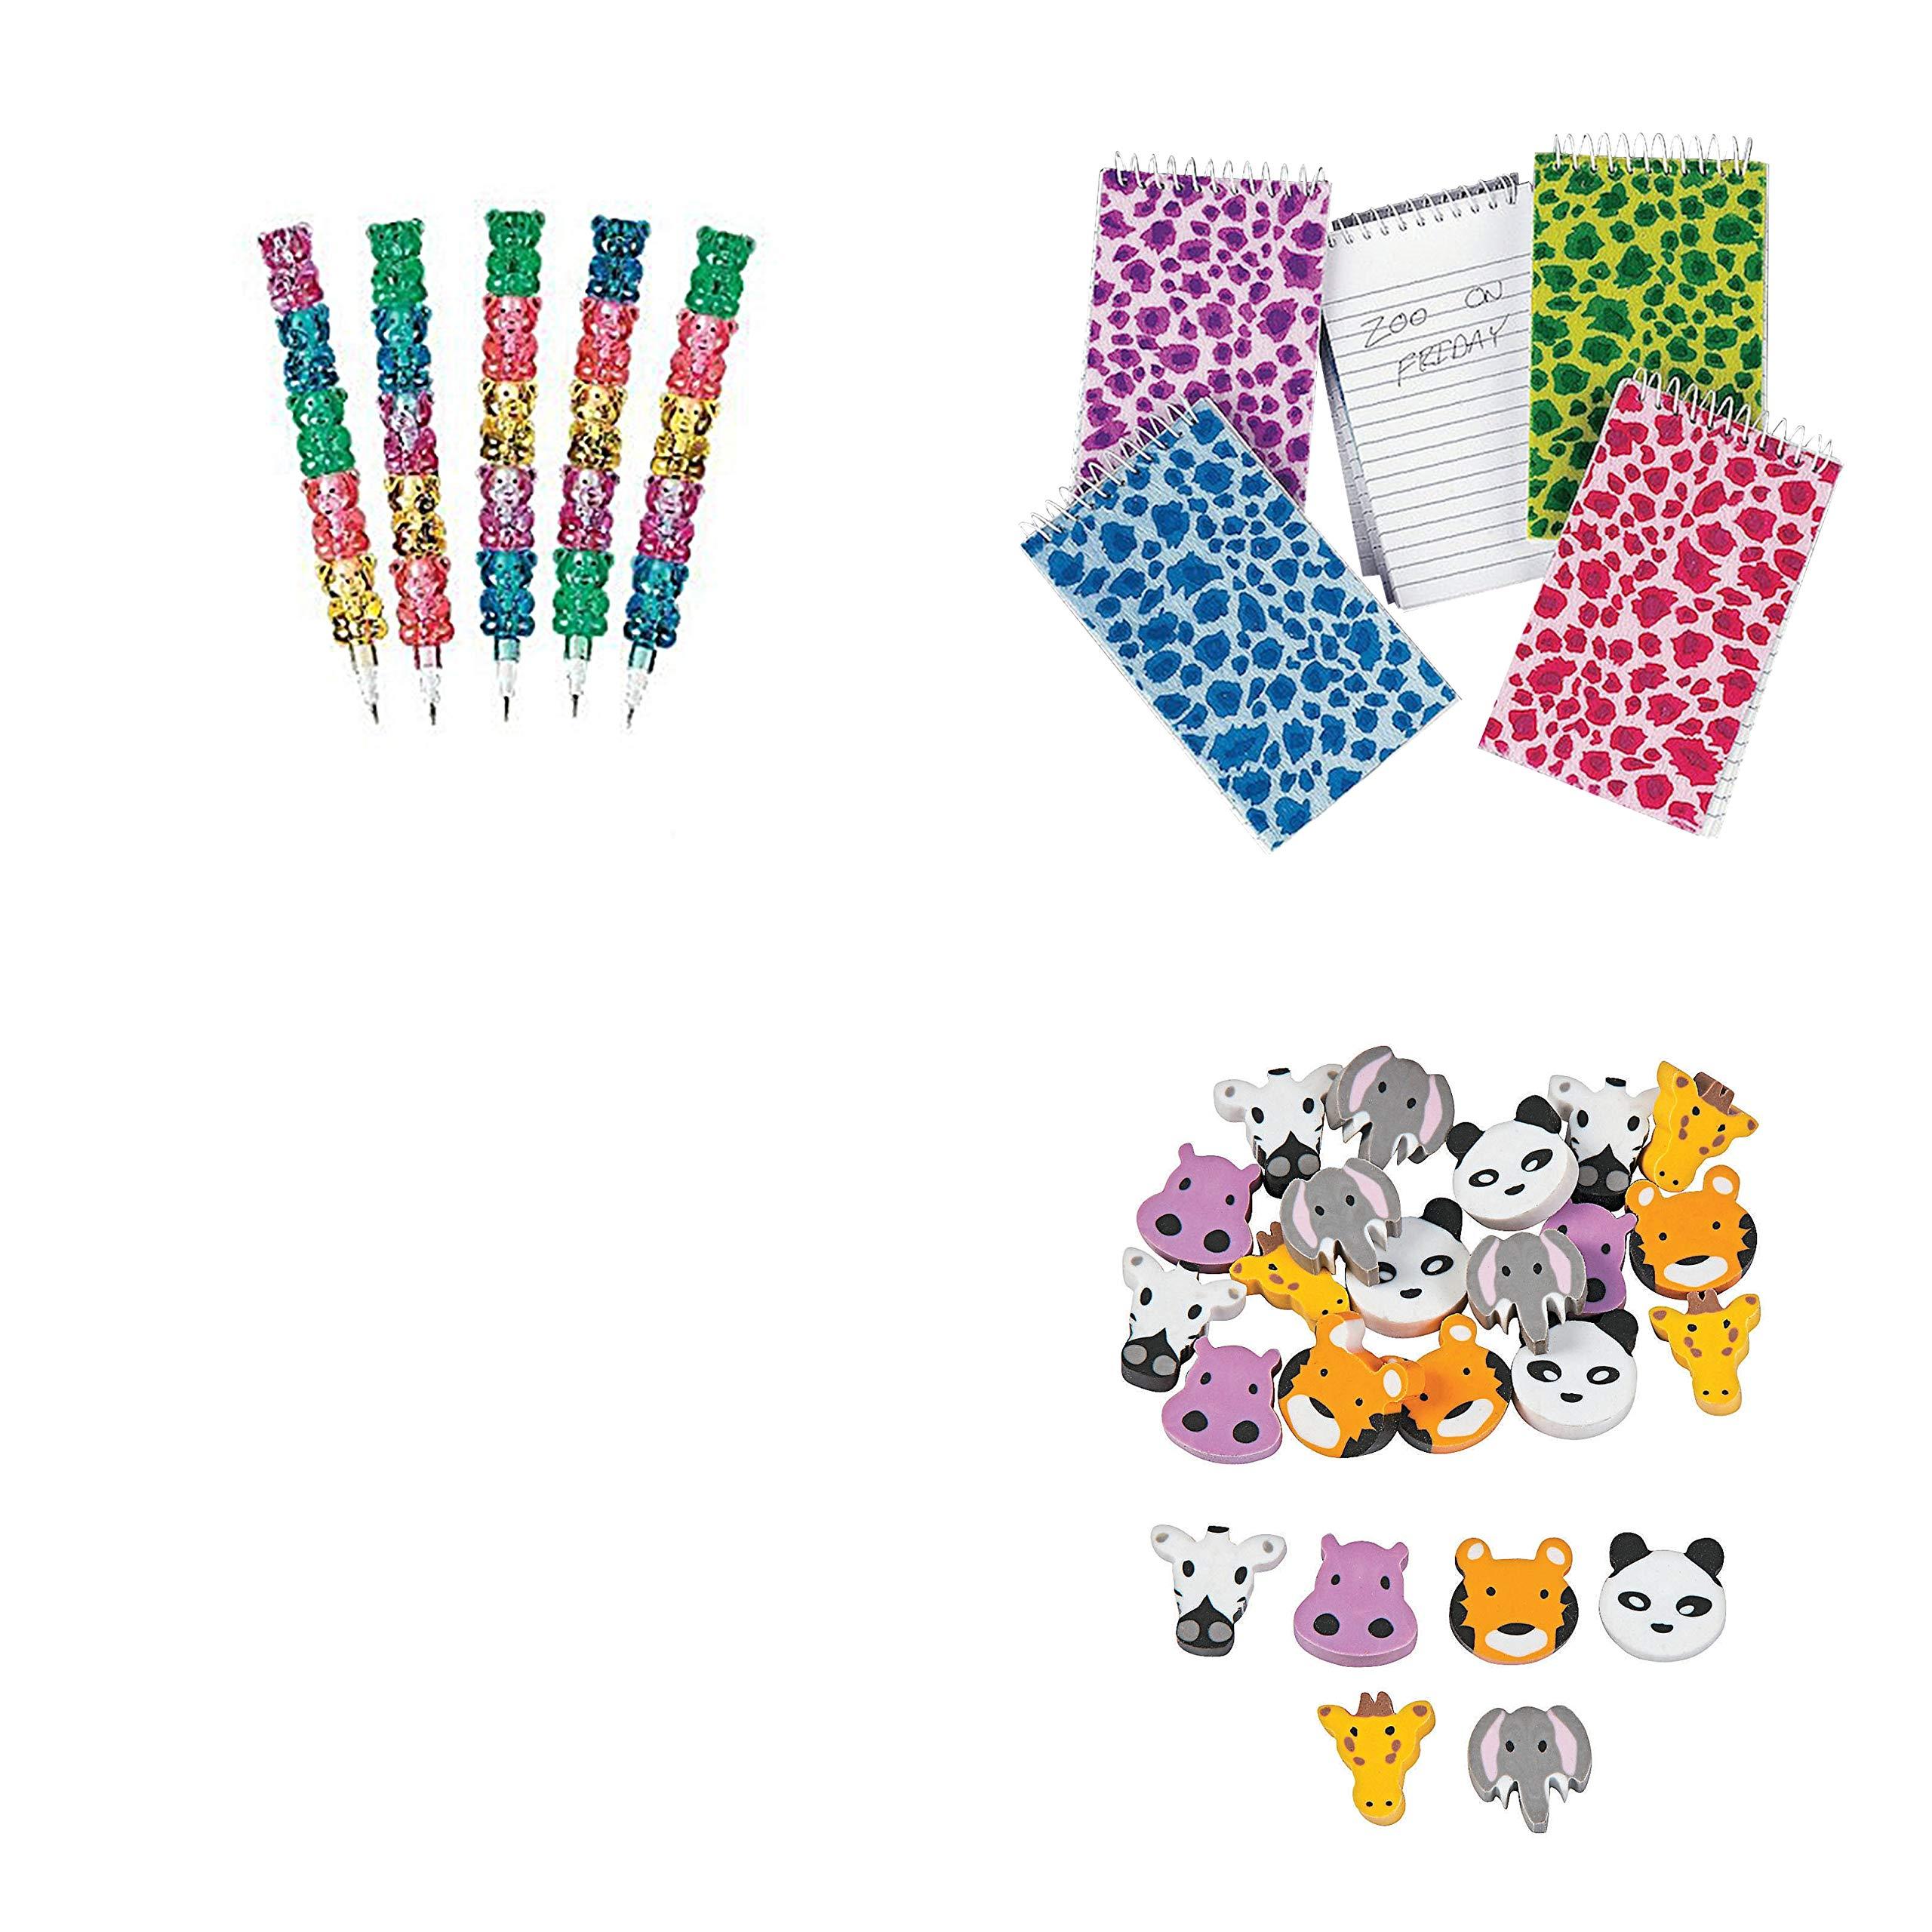 Stackable Bear Pencils, Plush Animal Print Spiral Notepads, Erasers Bundle For 12 People